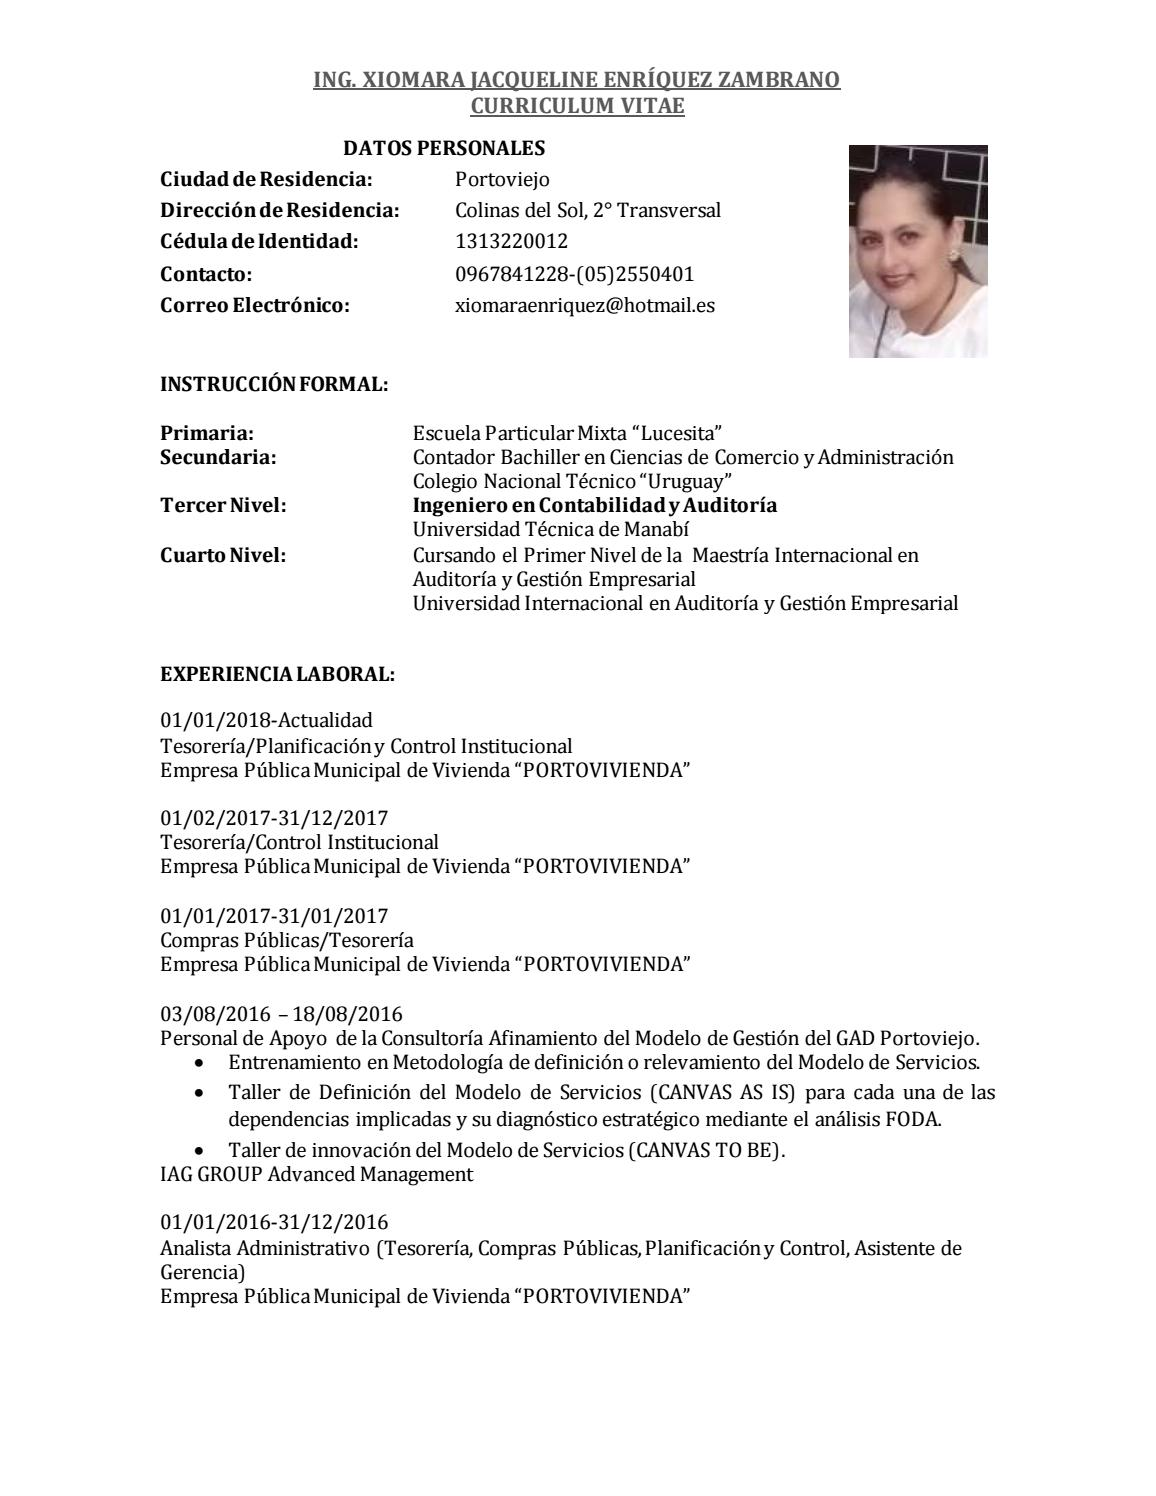 Curriculum Actual Xjez 24 01 2018 1 By Jorgefarfandg Issuu